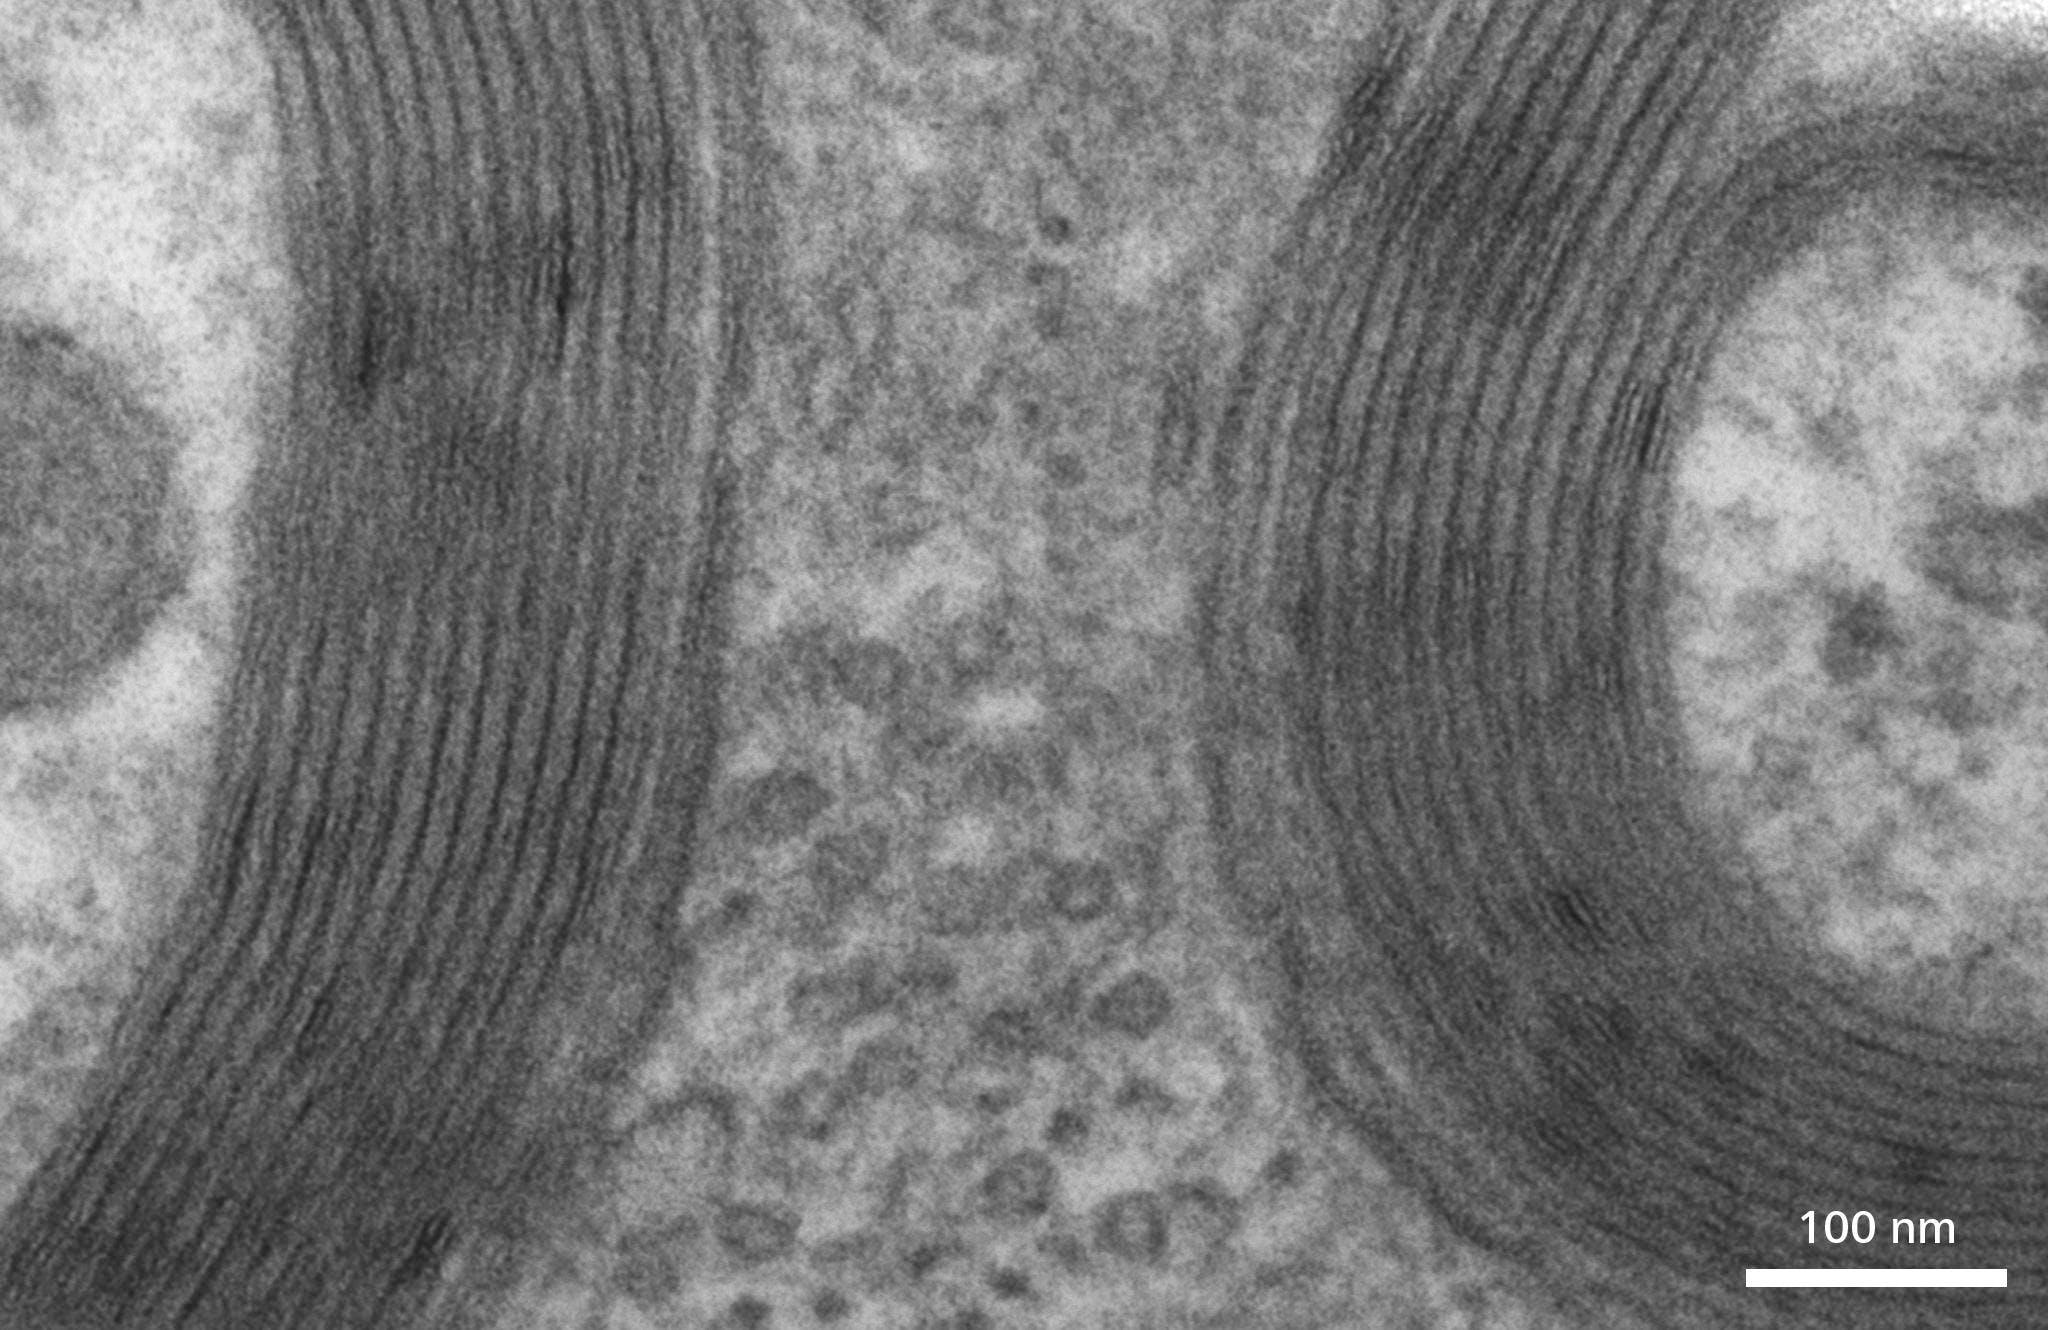 myelin tree rings